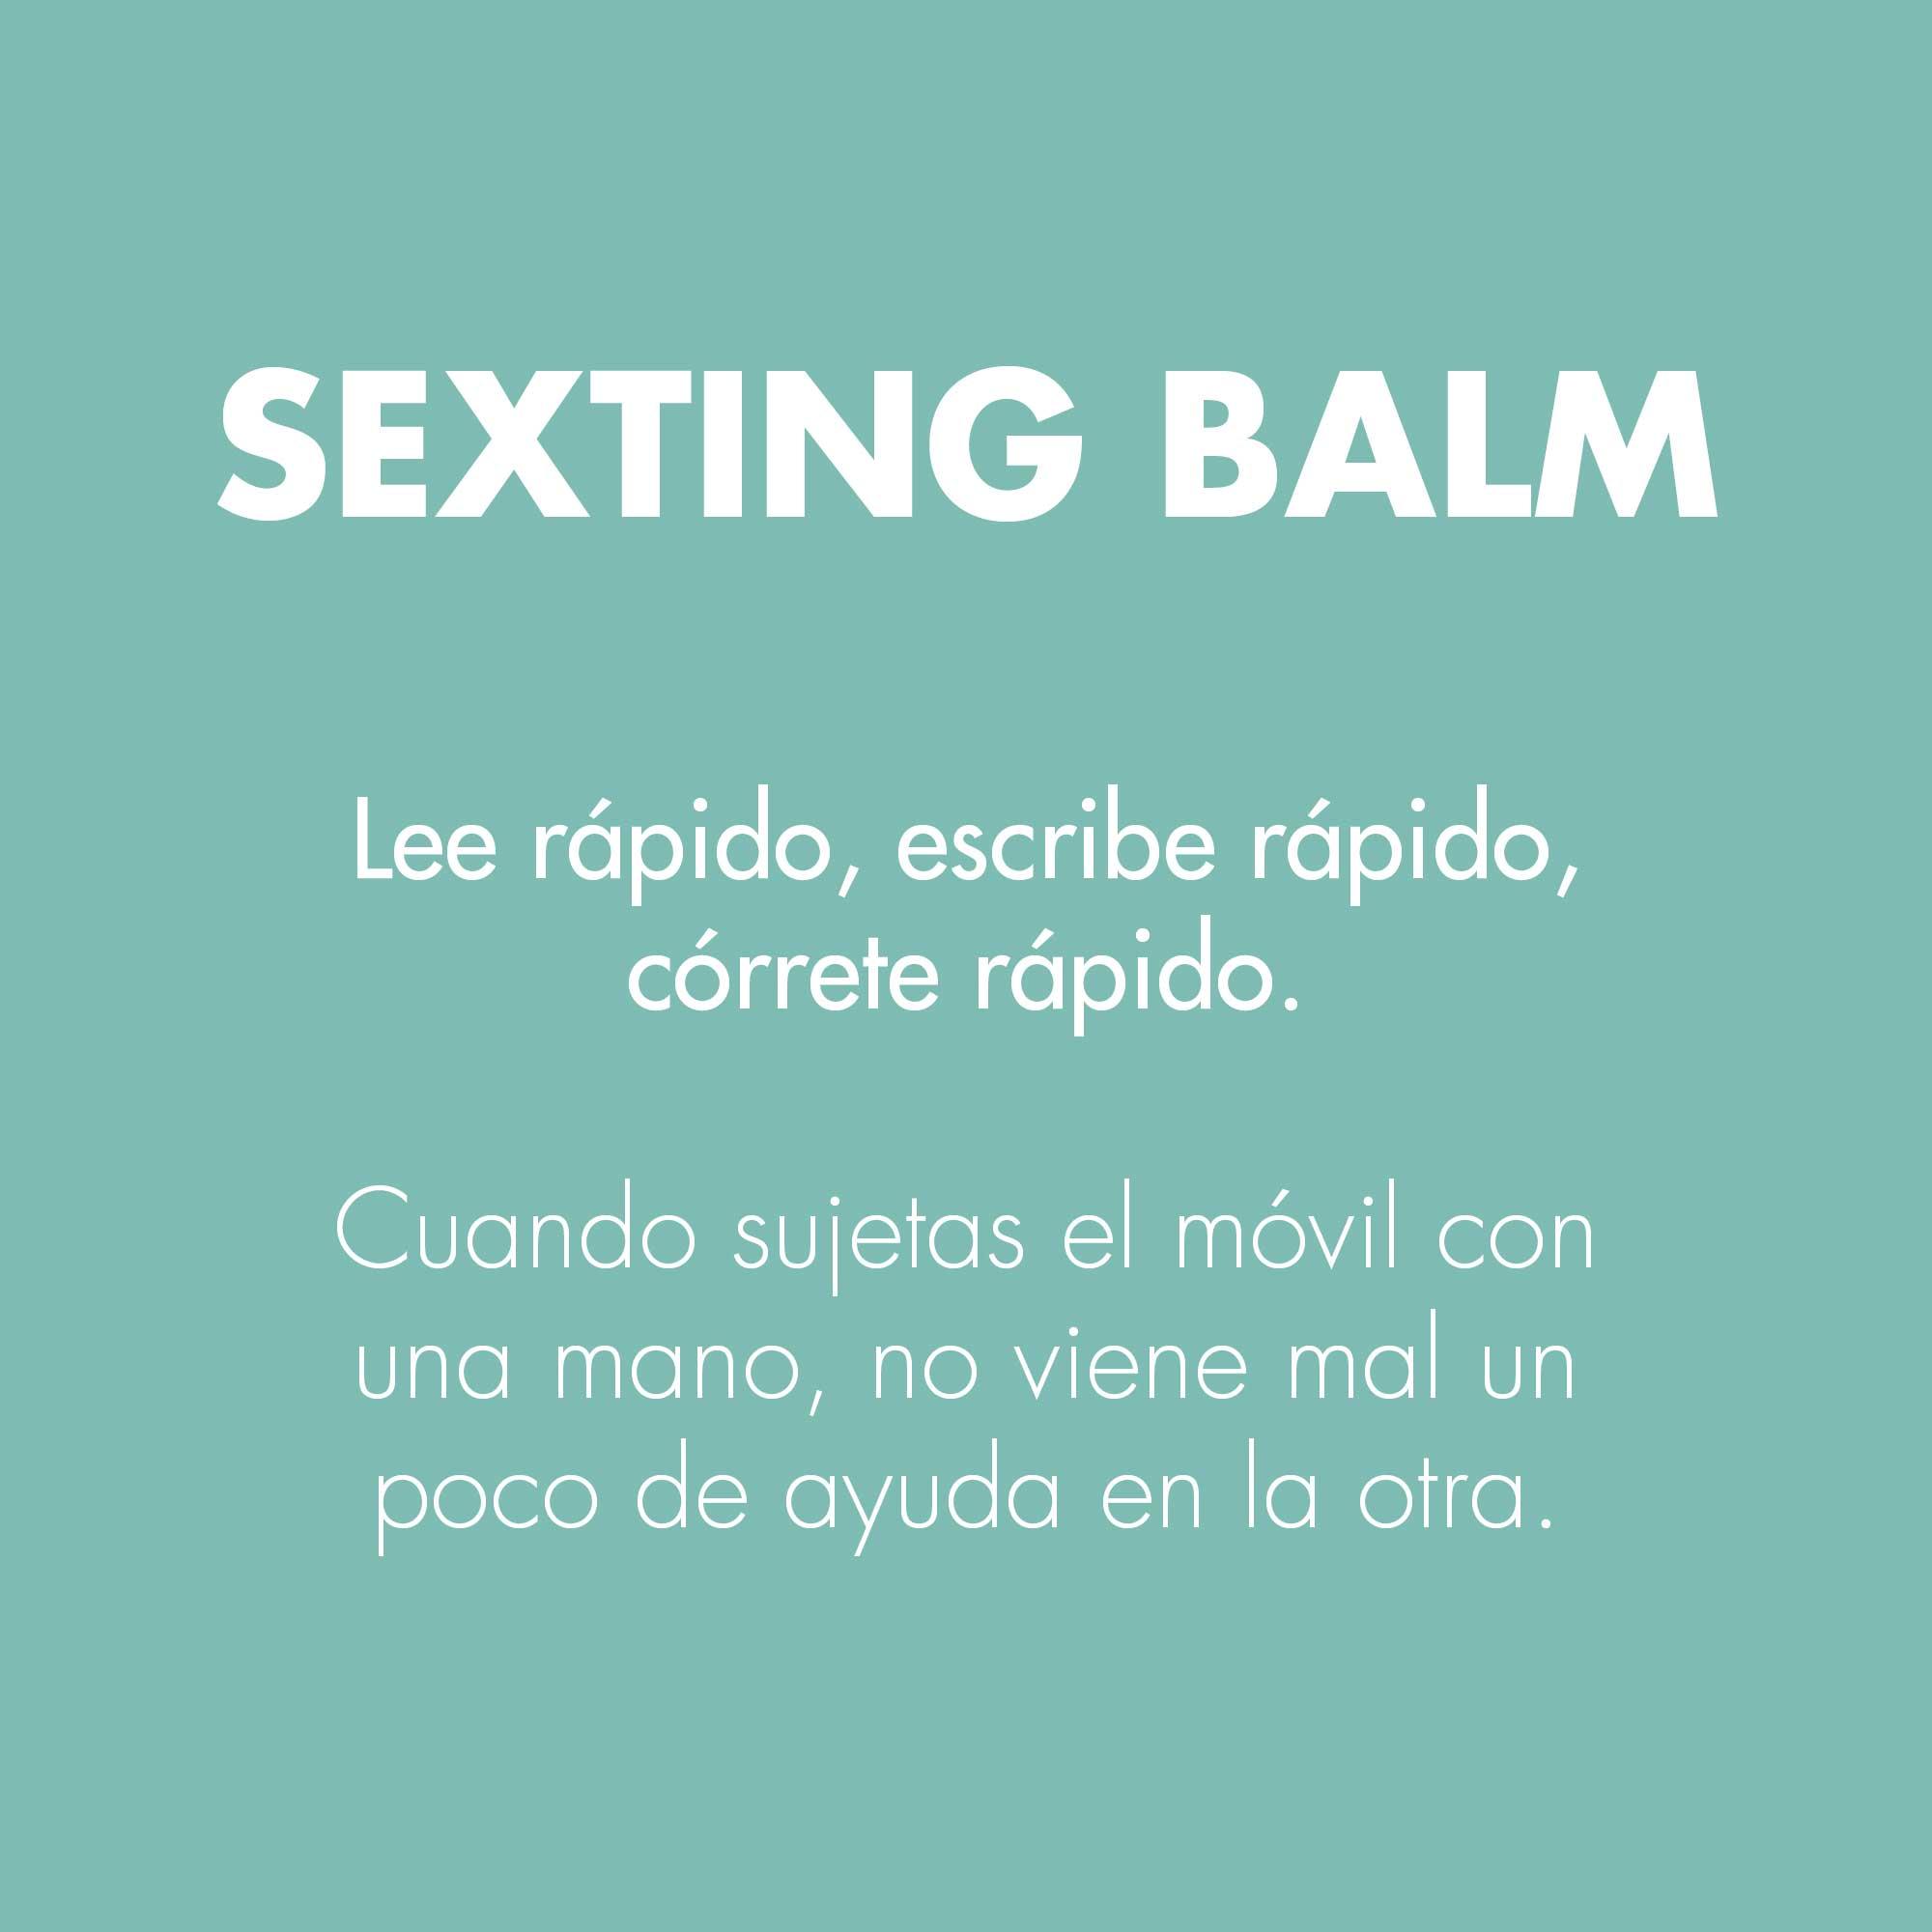 0335_SEXTING-BALM_3. Jpg